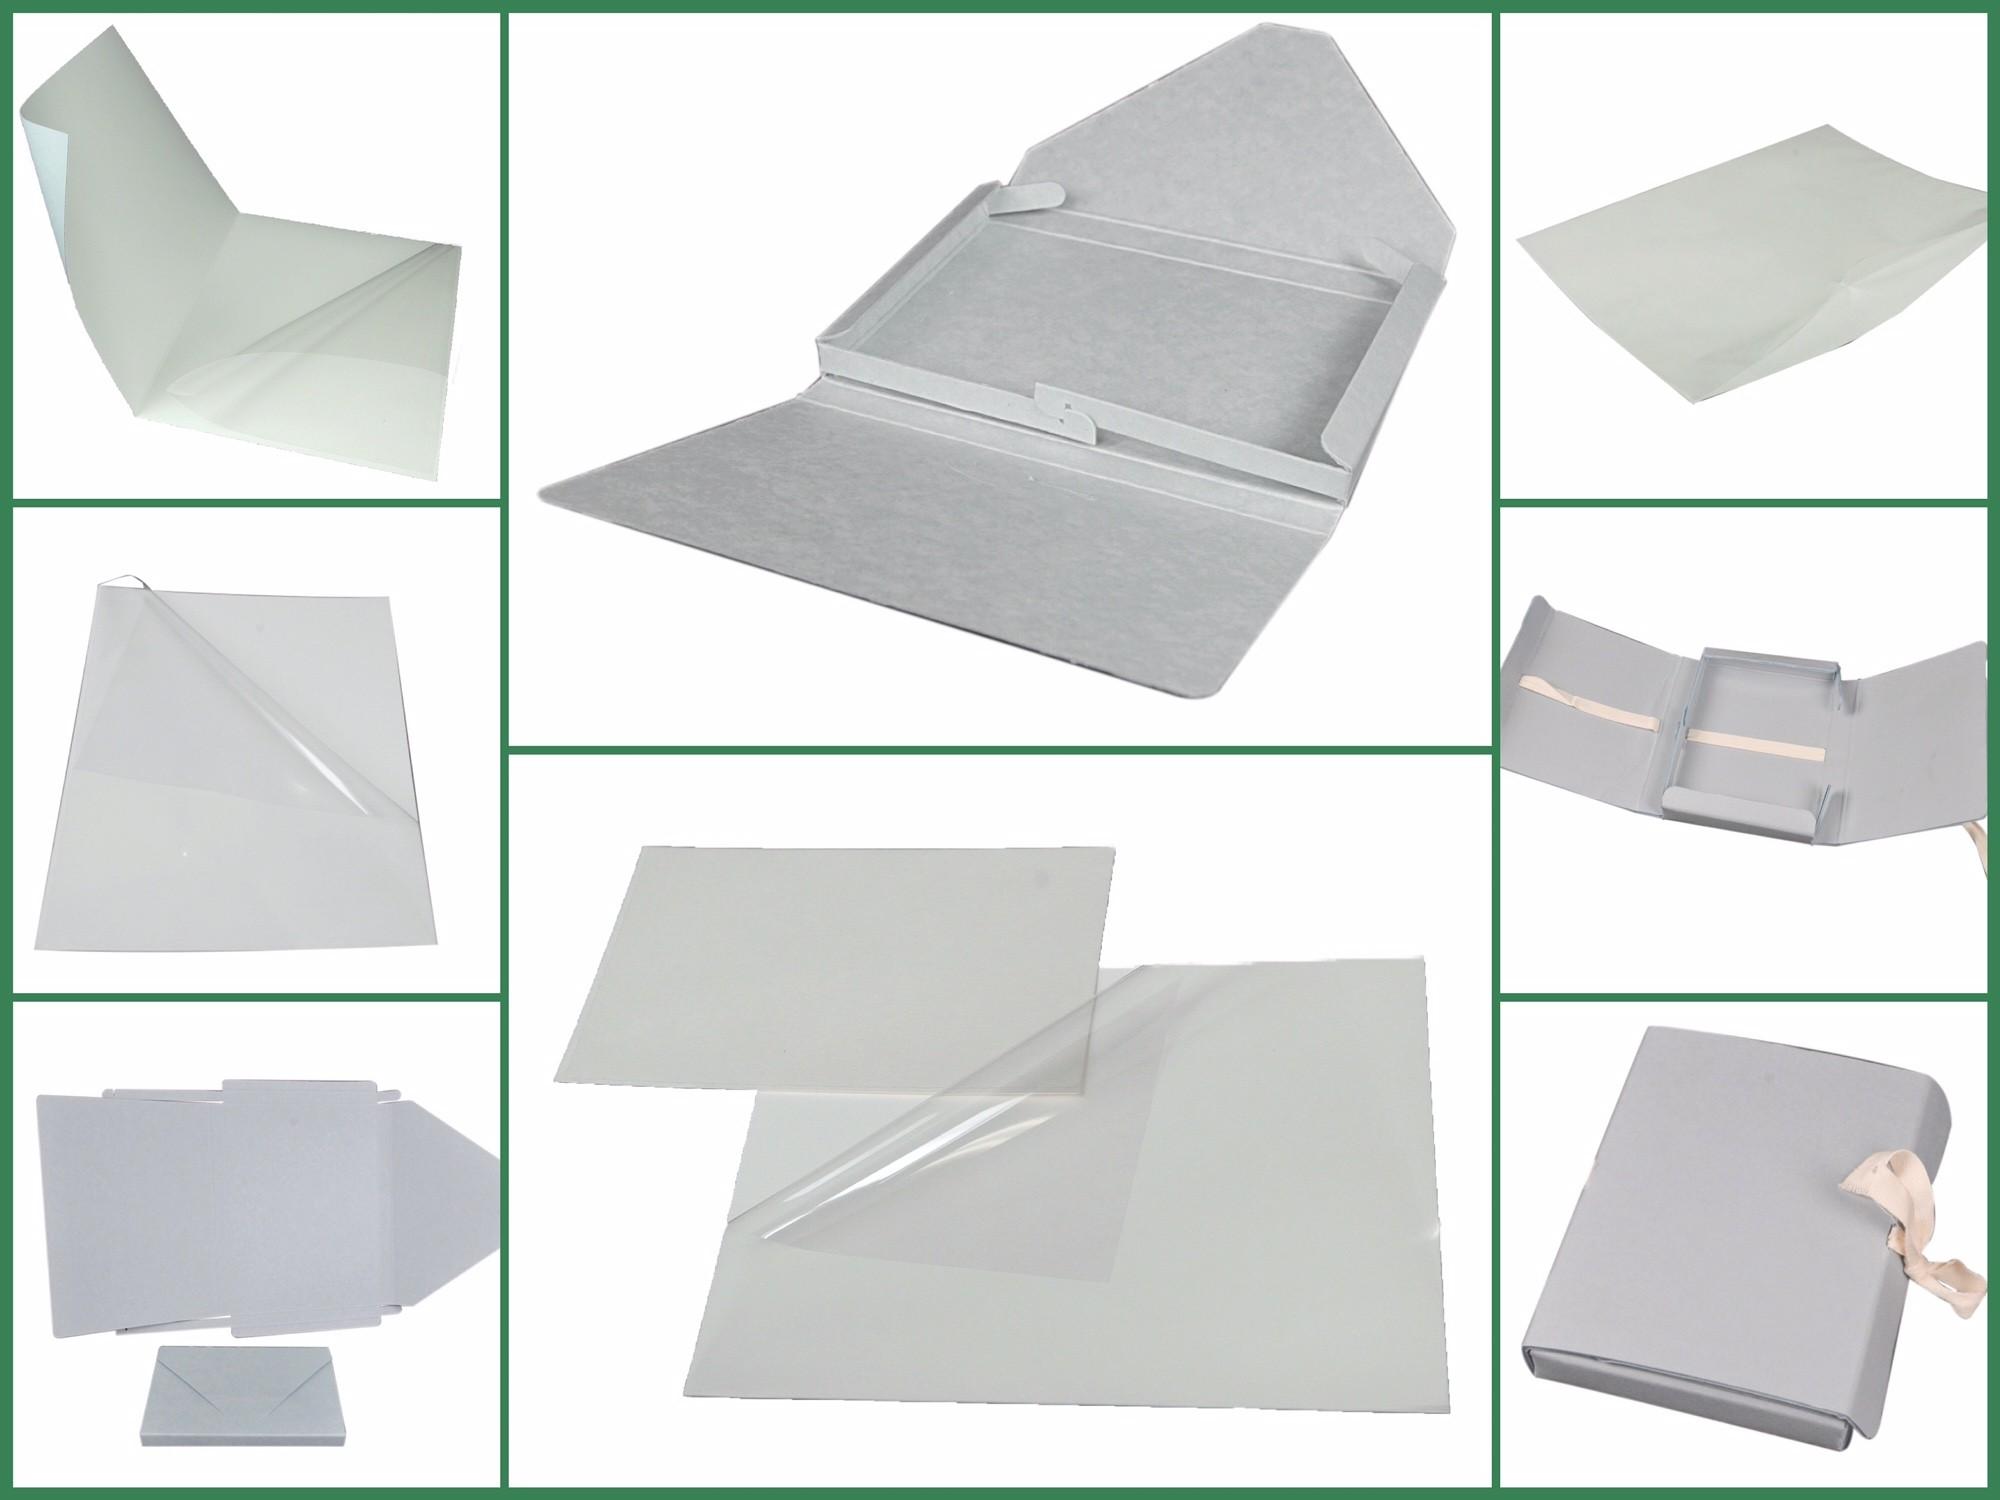 Folder boxes - Folders - Protectors